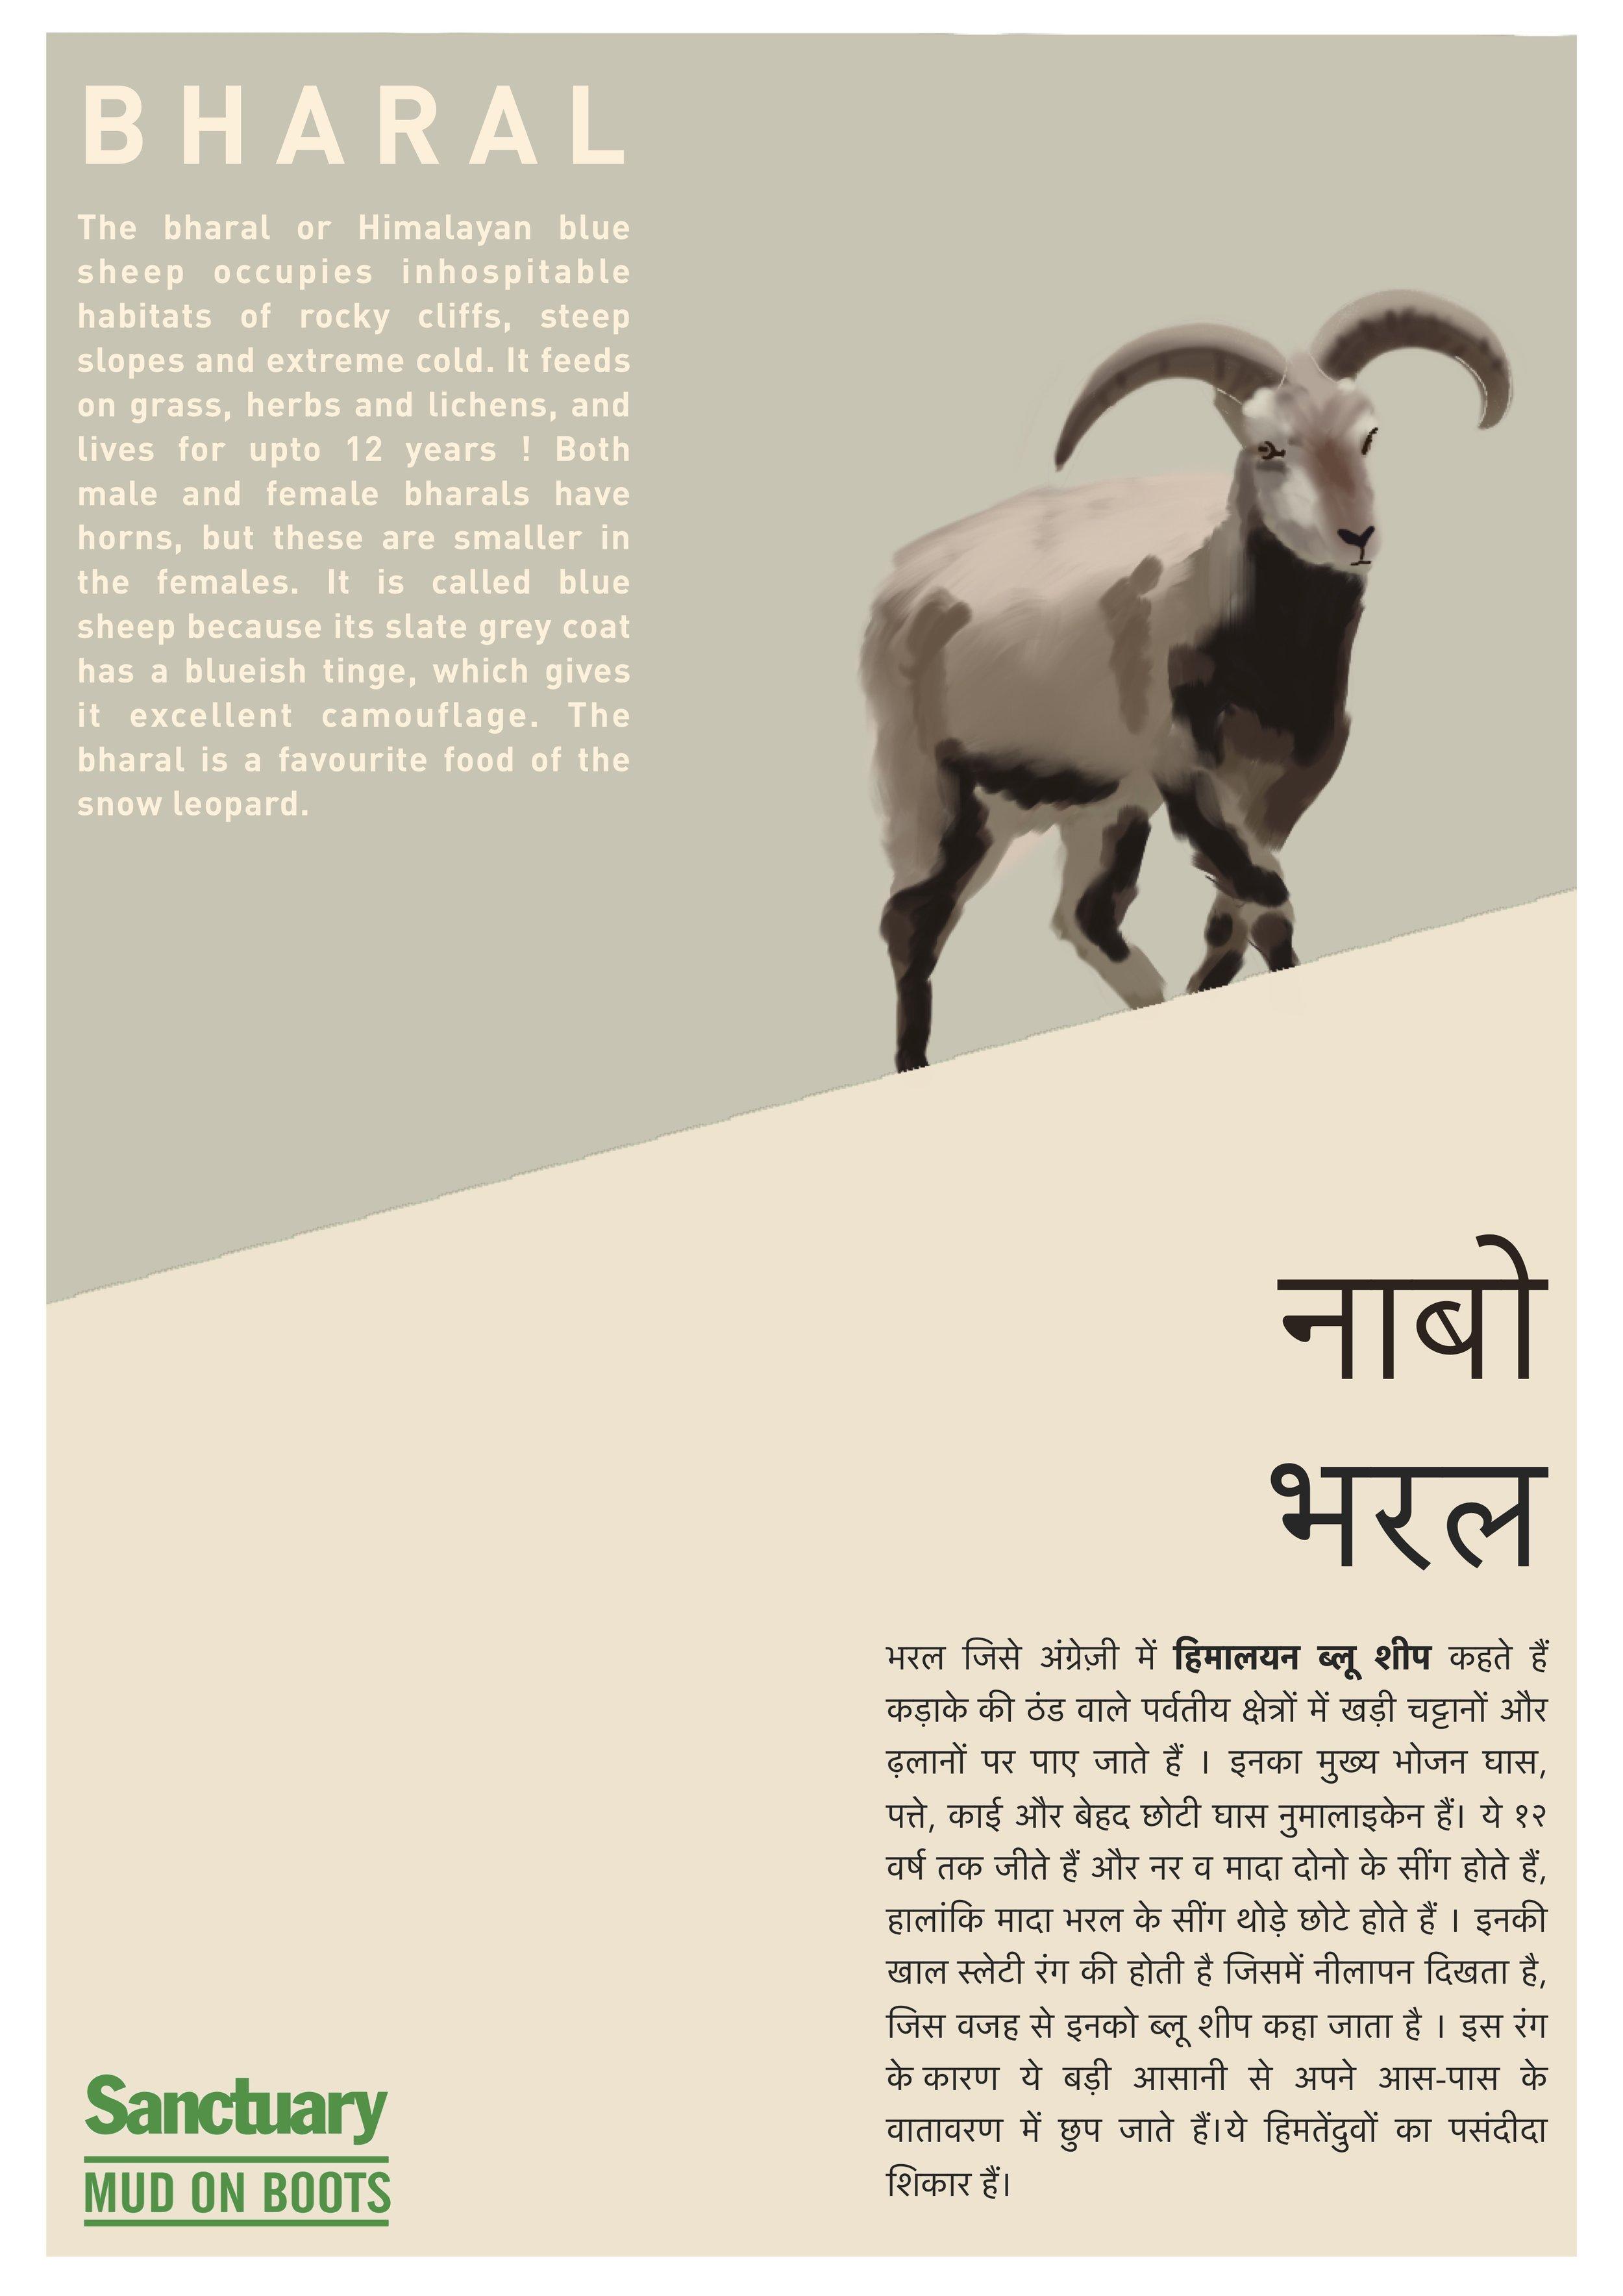 bharal.jpg